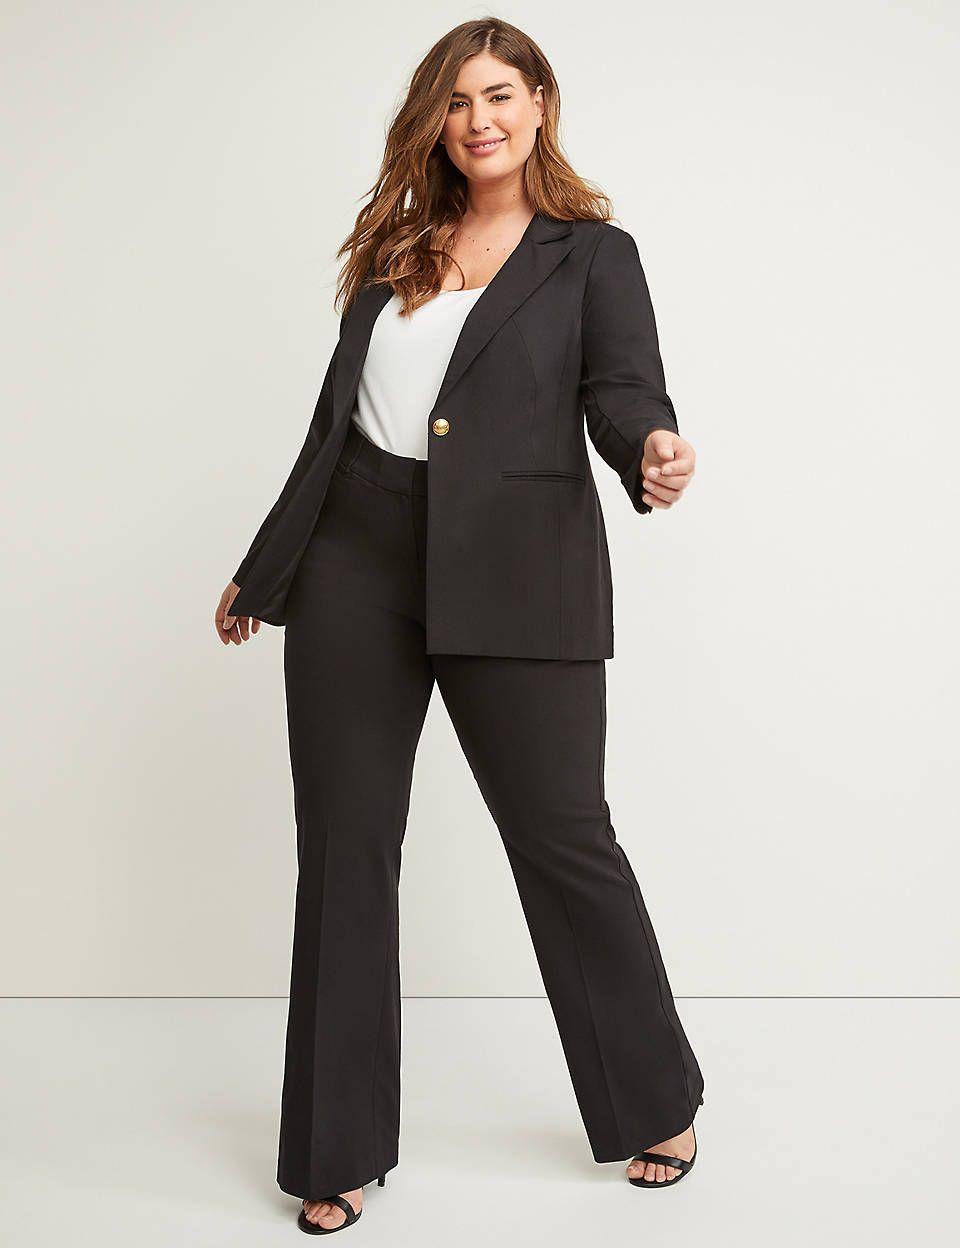 Lane Bryant Dressy Pant Suits